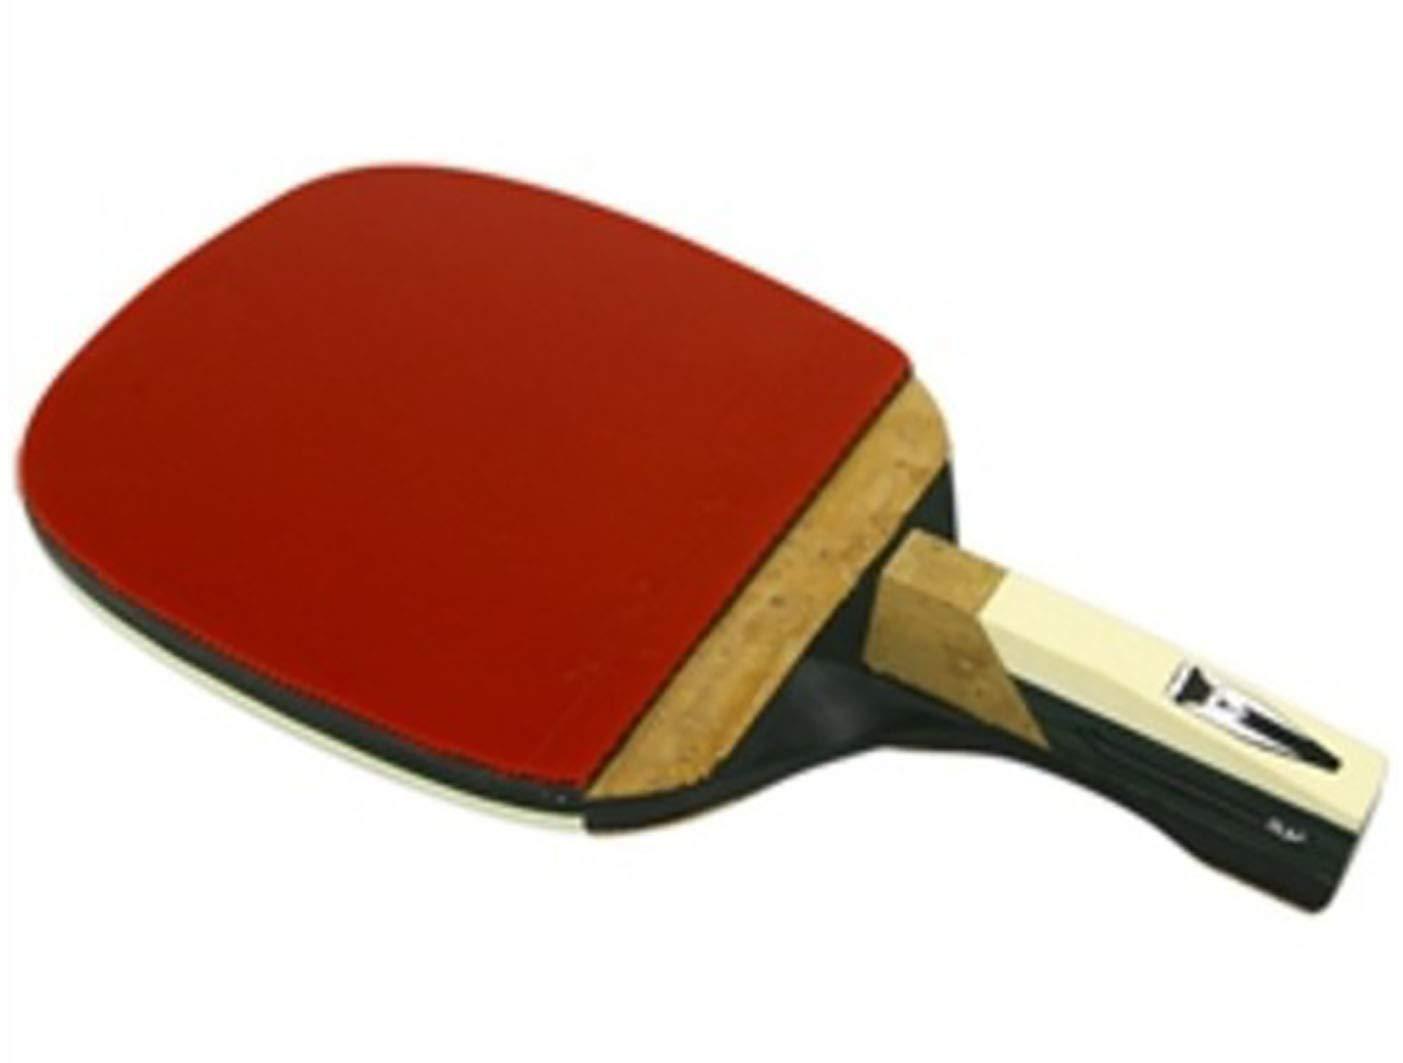 Xiom MUV 8.0P - Offensive Plus Premade Japanese Penhold Table Tennis Racket